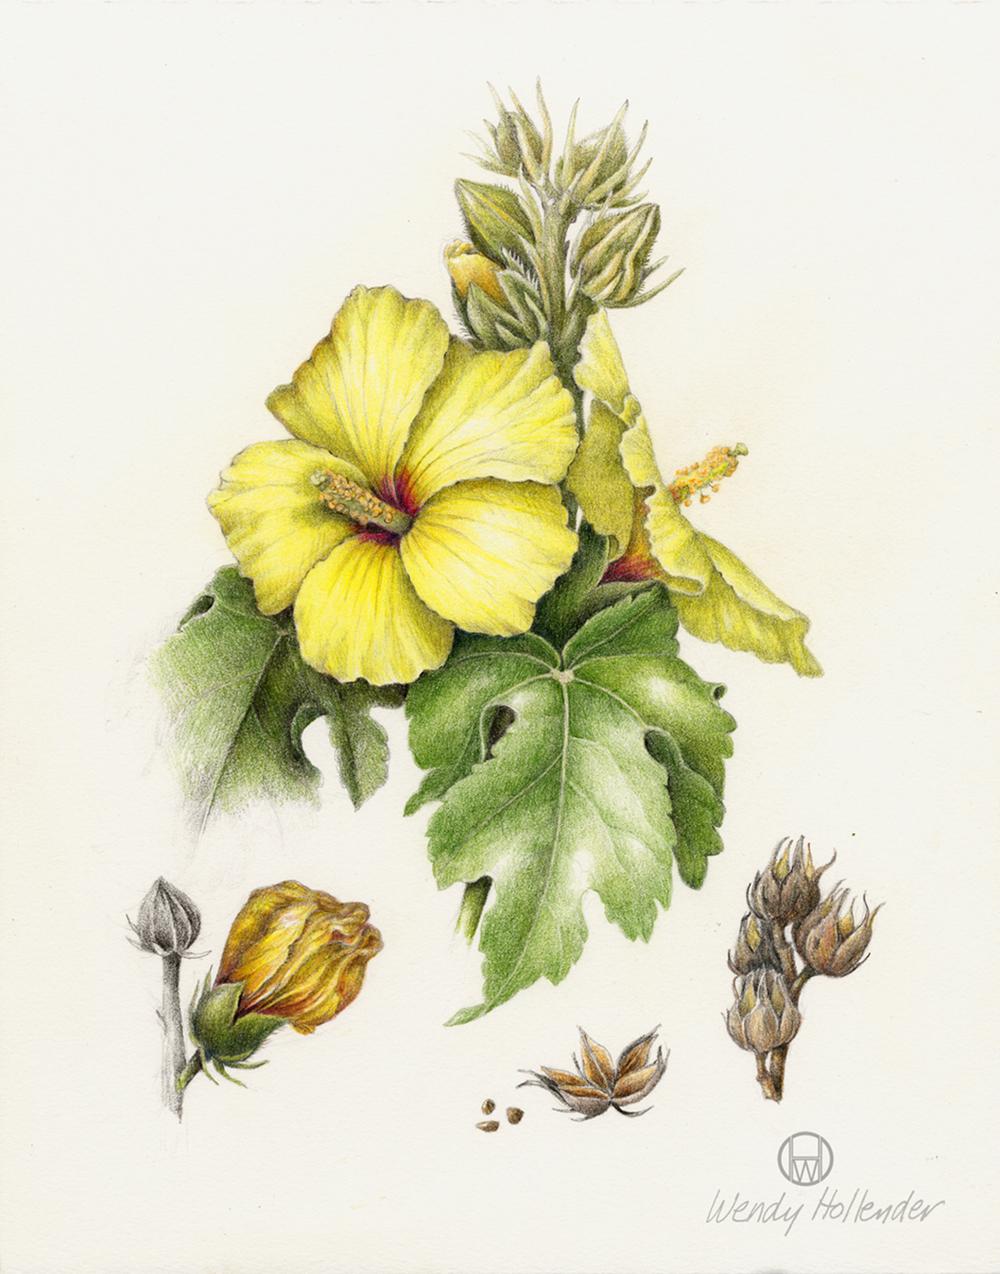 Hibiscus Ma'o hau hele